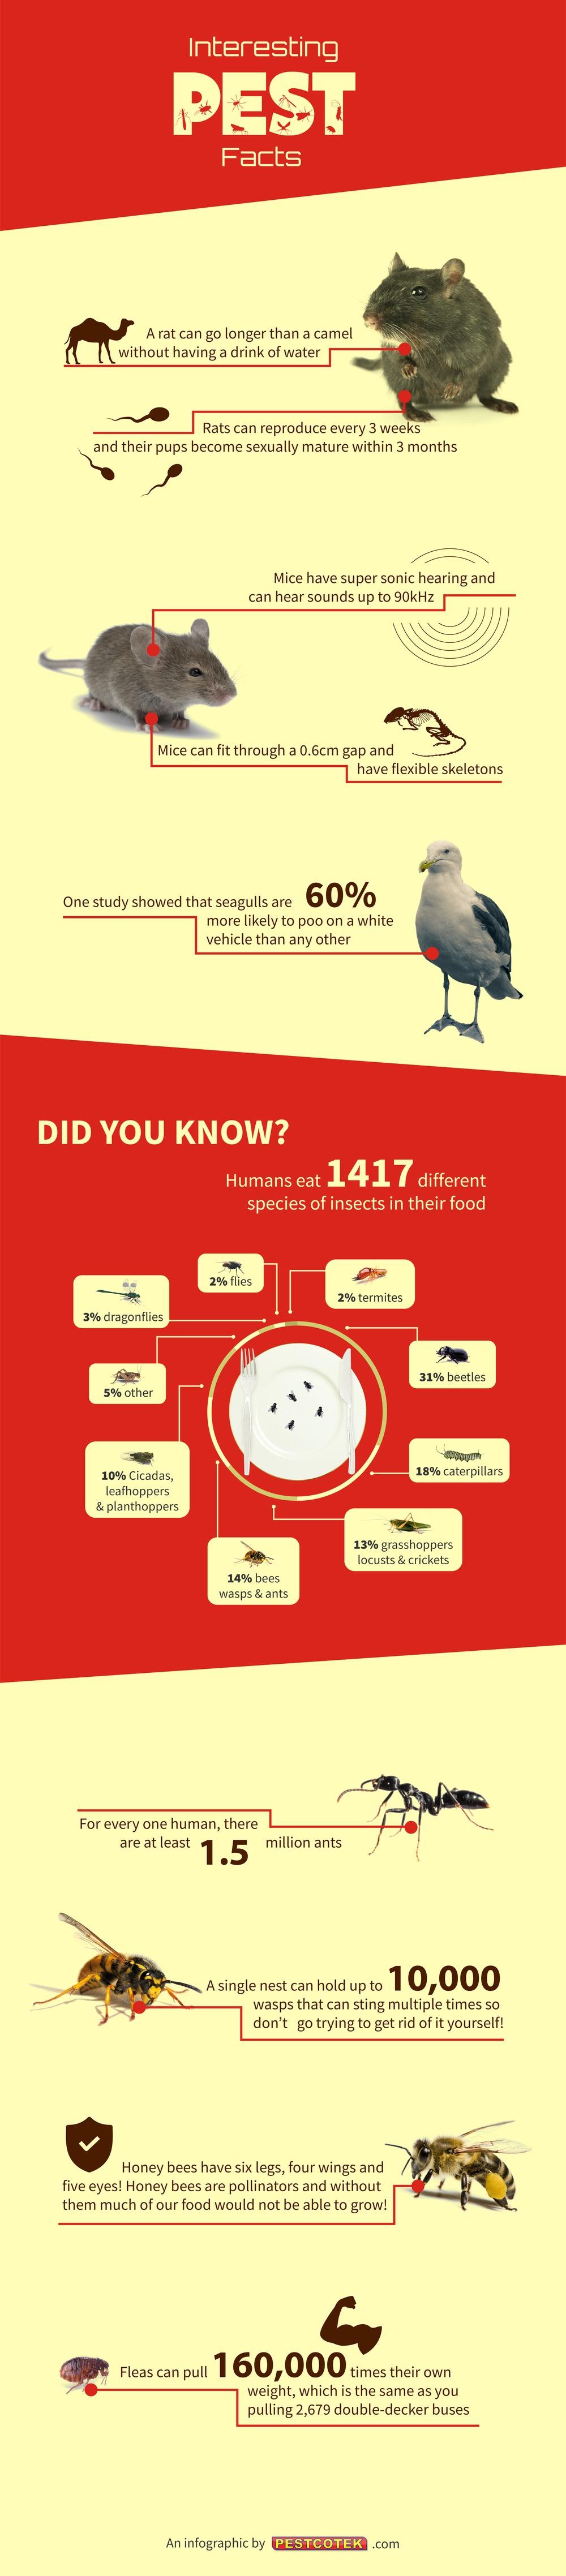 Interesting Pest Facts by Pestcotek